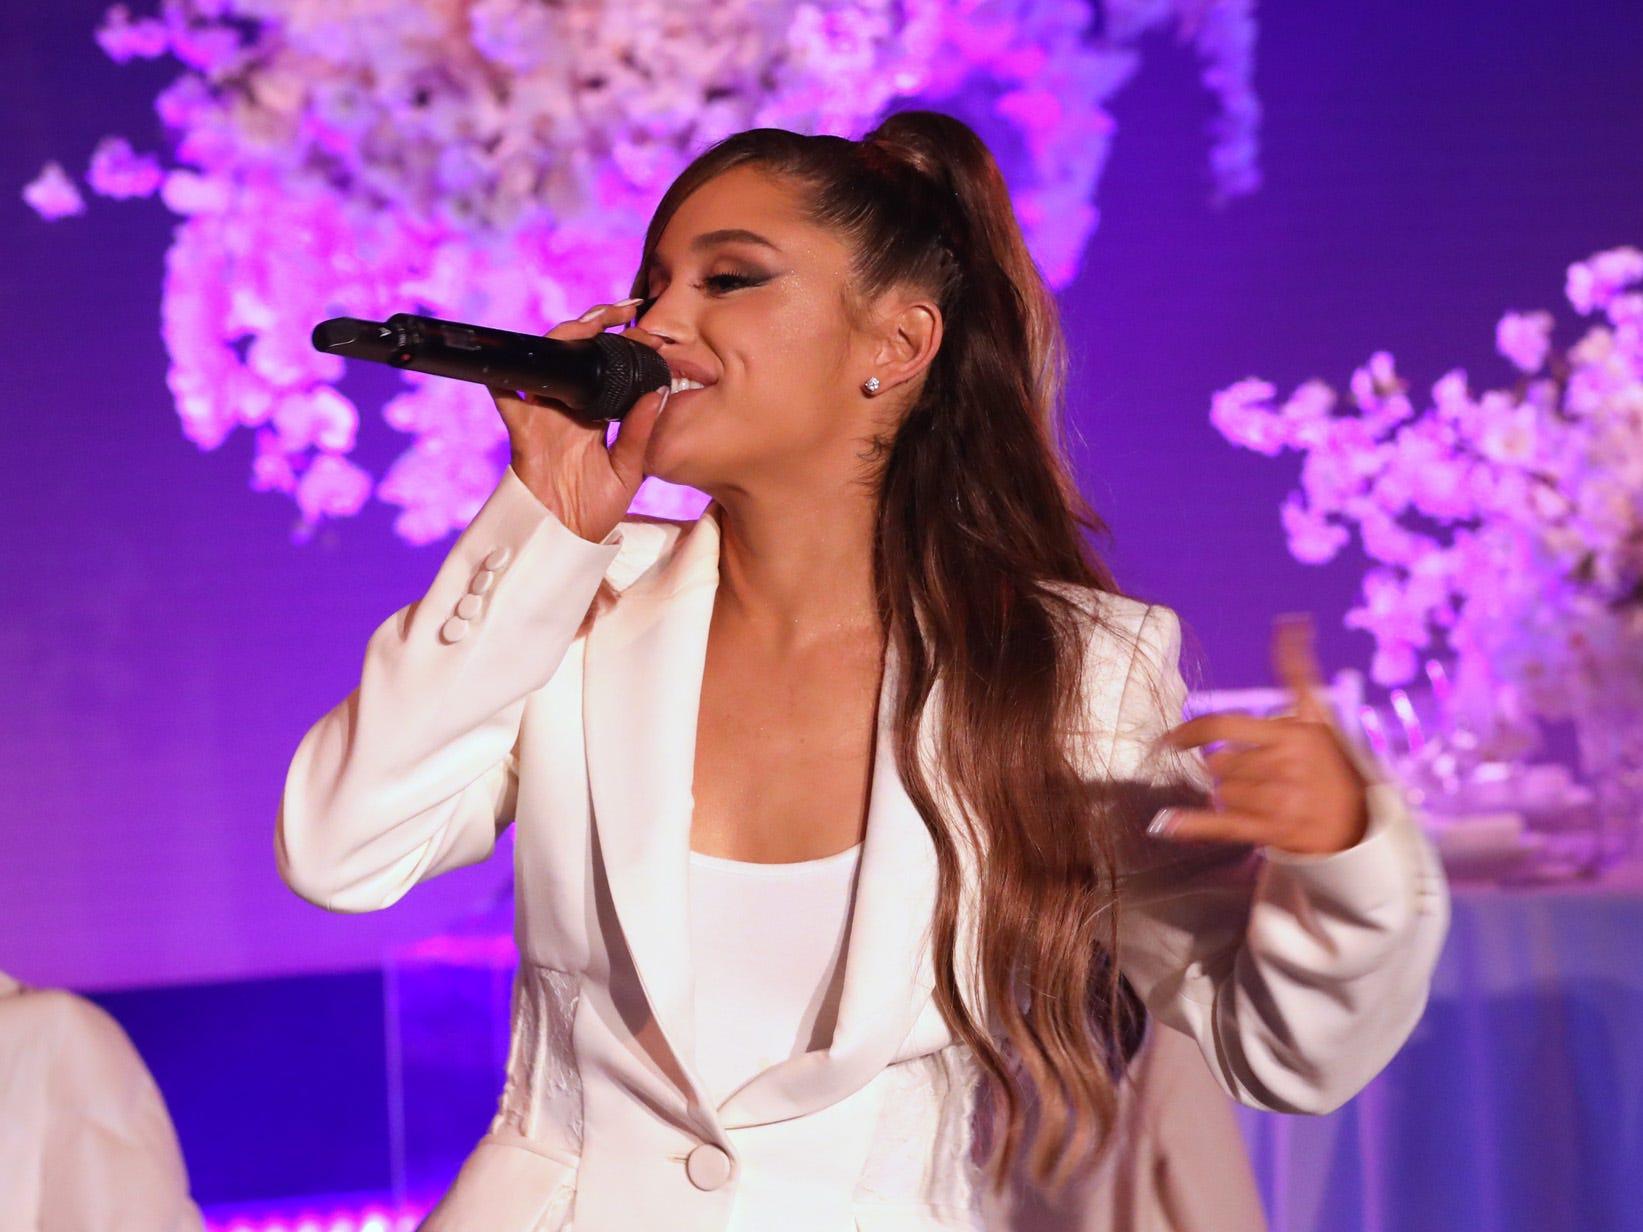 Twitter beef brews between Ariana Grande, Piers Morgan and Grande's mom